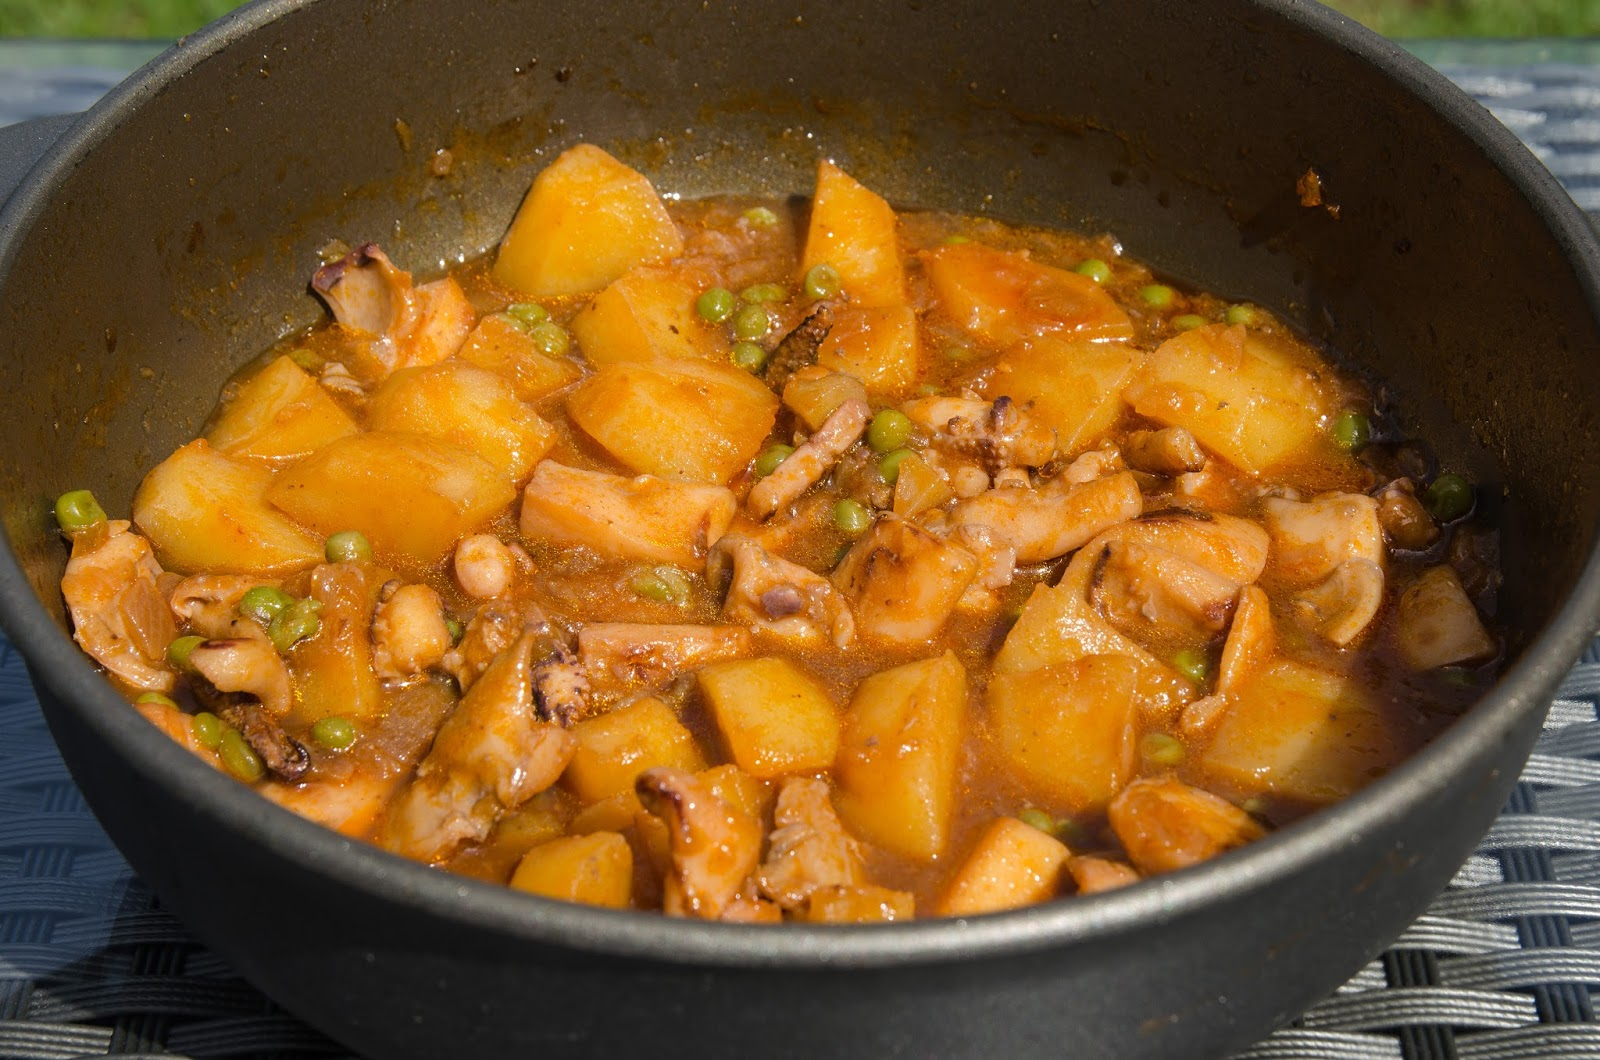 como-hacer-sepia-patatas-guisante-pescado-recetas-cocina-faciles-casera-saludable-sana-ligera-adelgazar-bruja